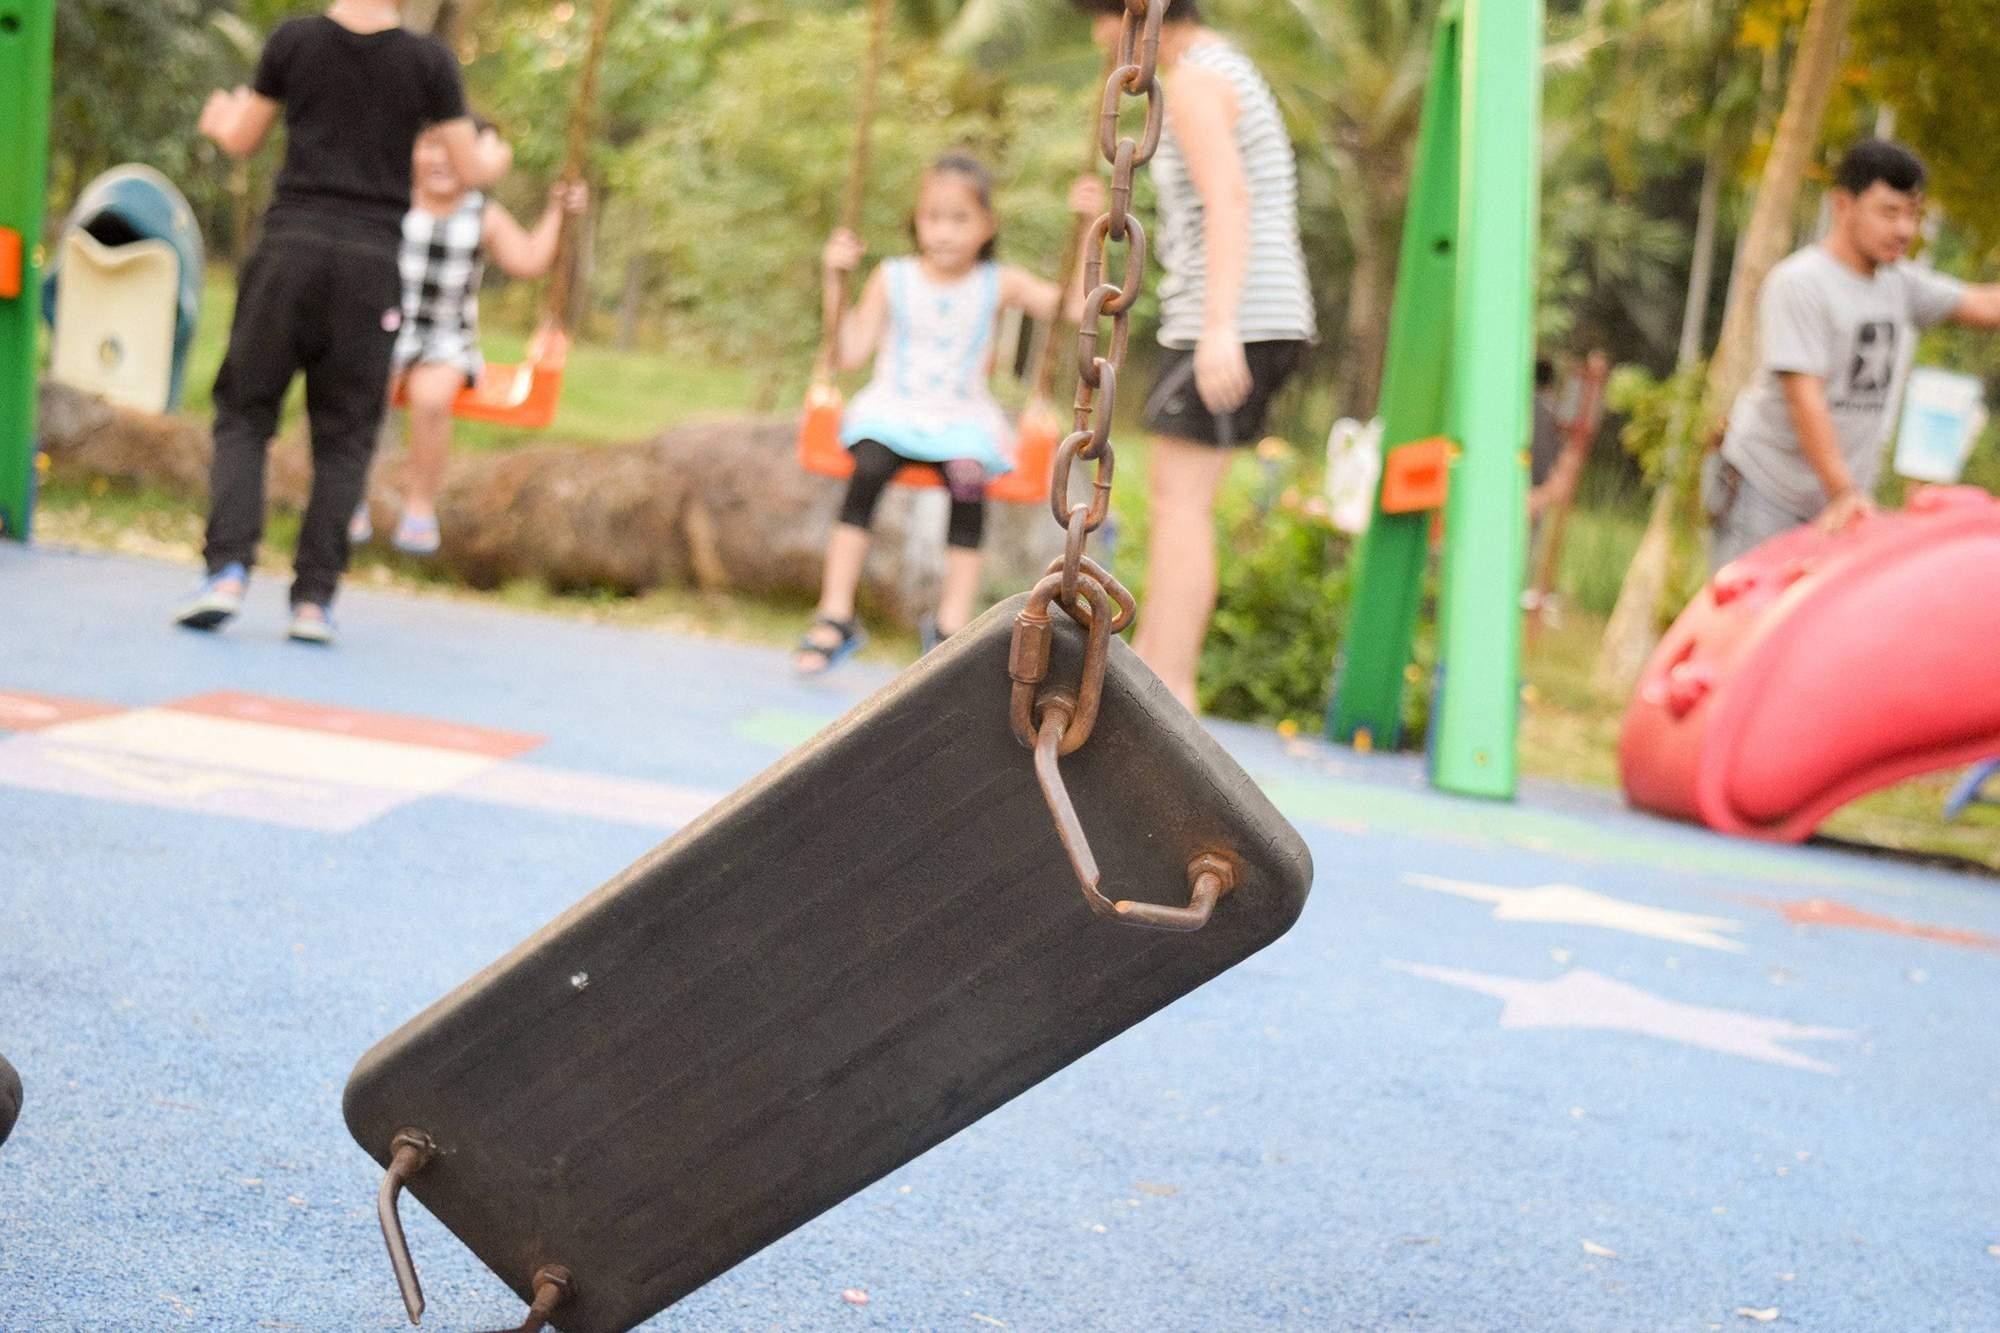 Playground/School Accidents